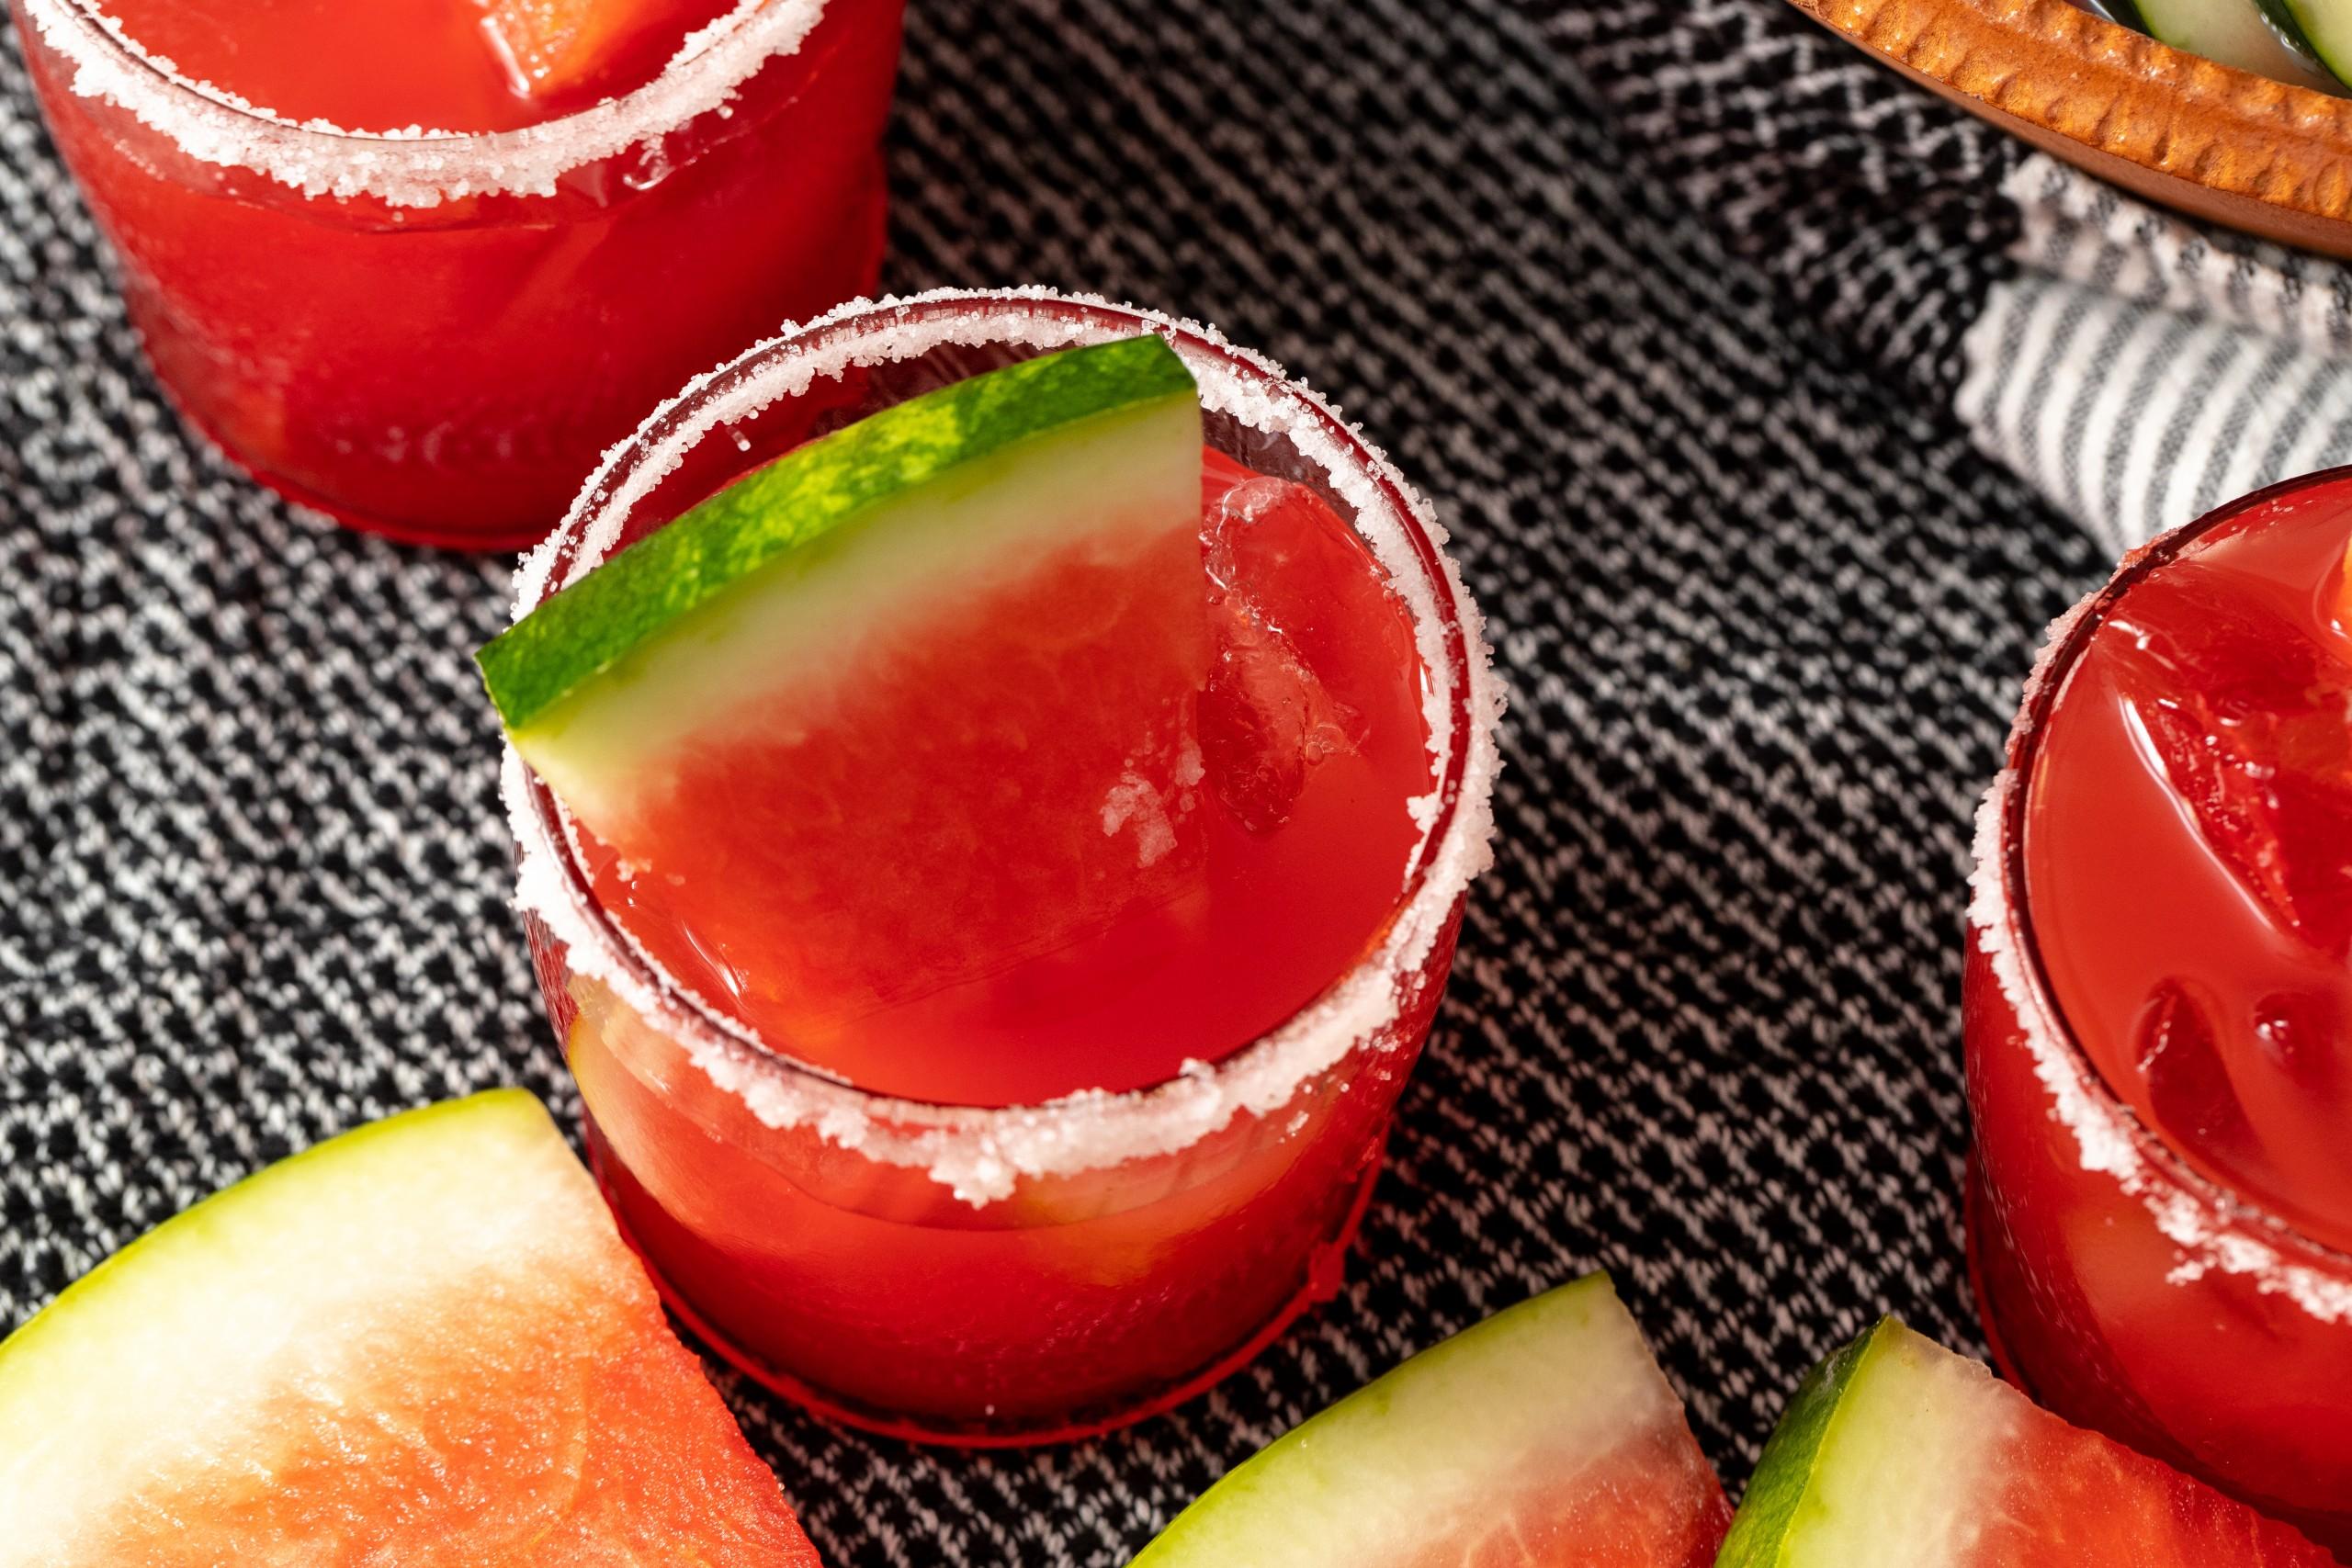 watermelon margarita made from fresh watermelon juice